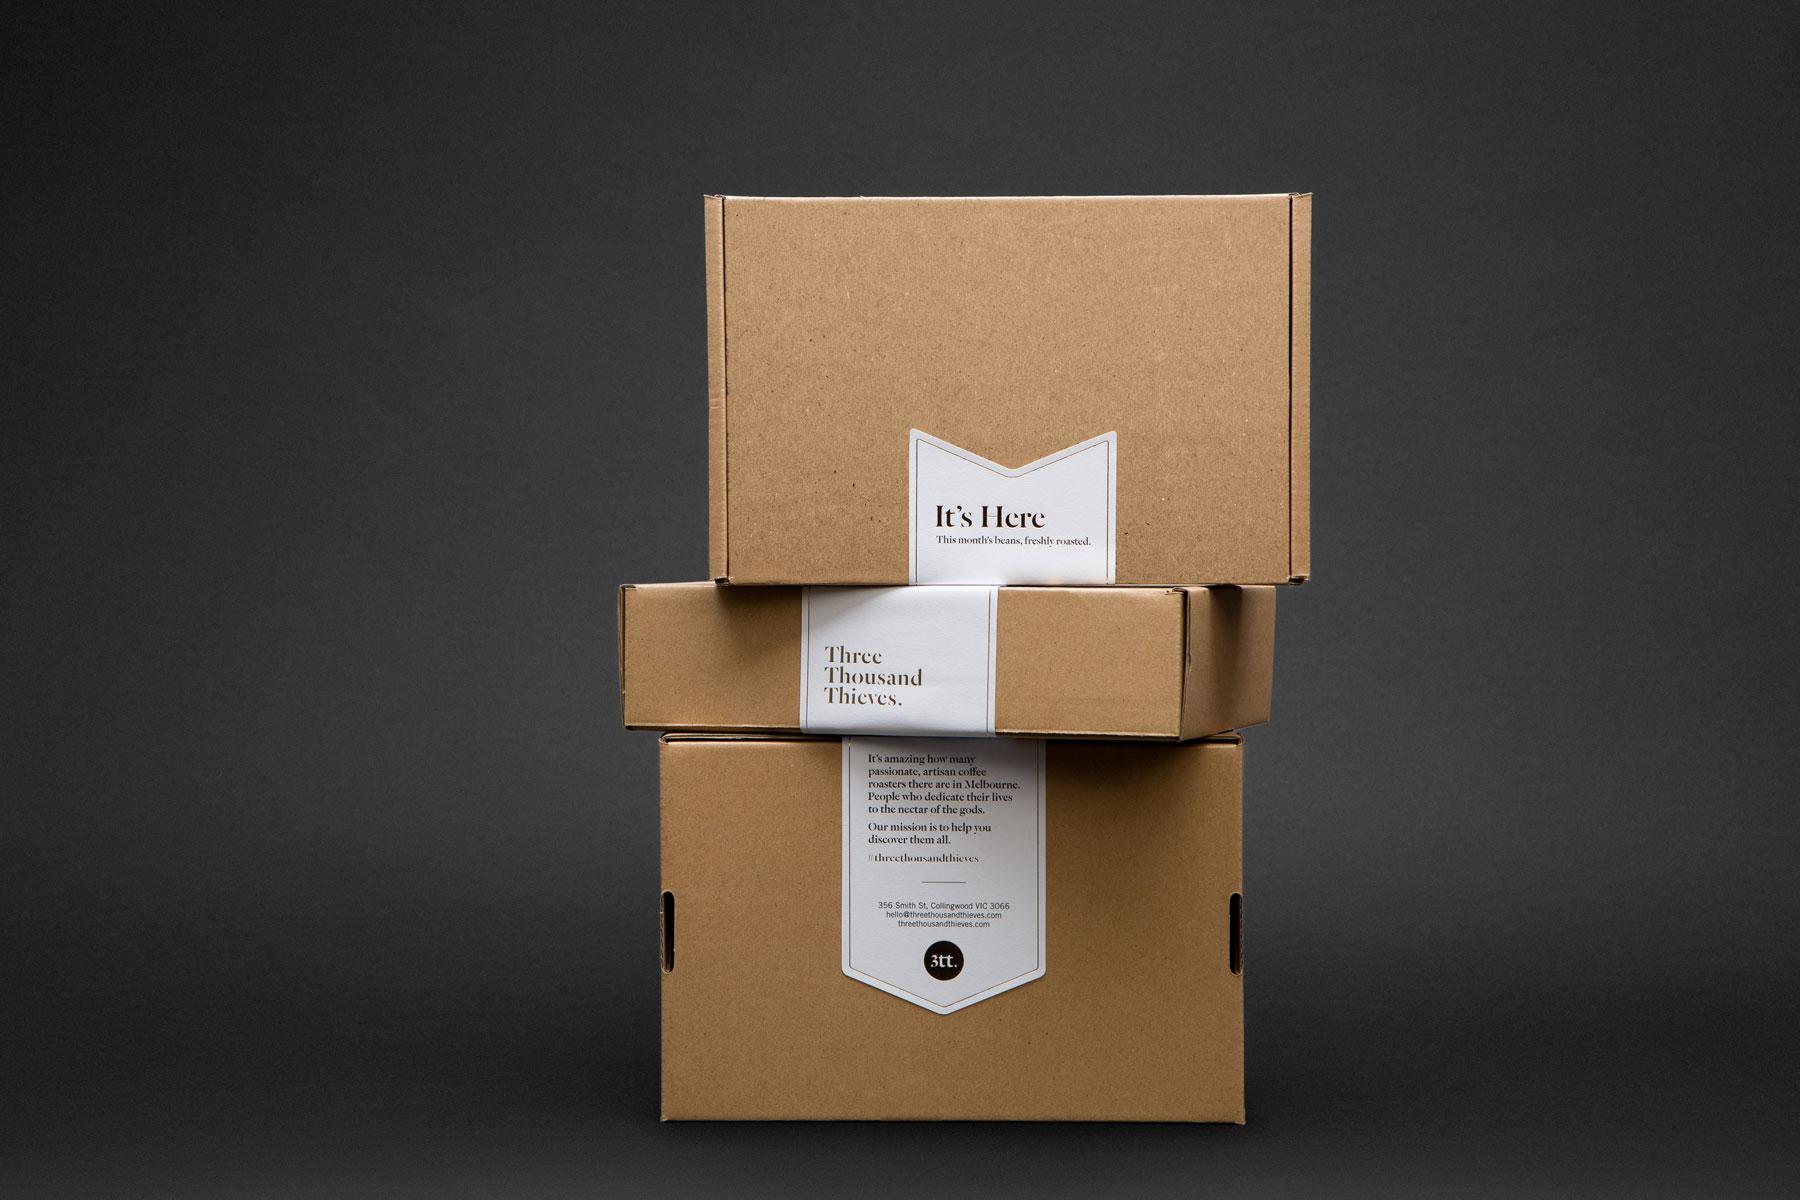 3TT-Box